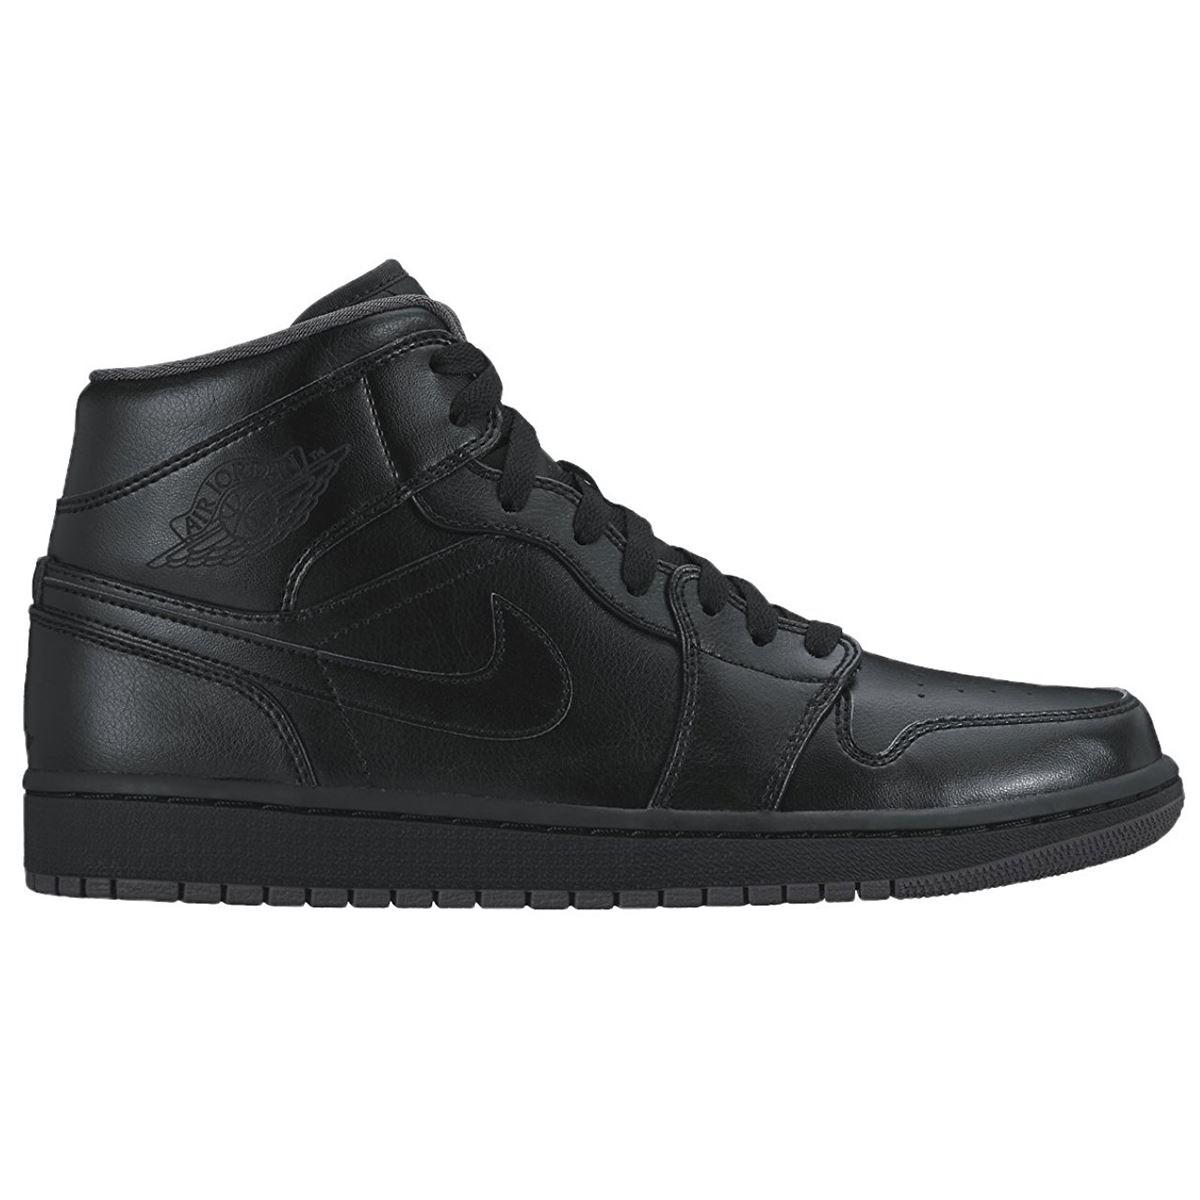 Nike Air Jordan Jordan Air 1 Mid 554724034 Hombre Trainers 1b3ee4